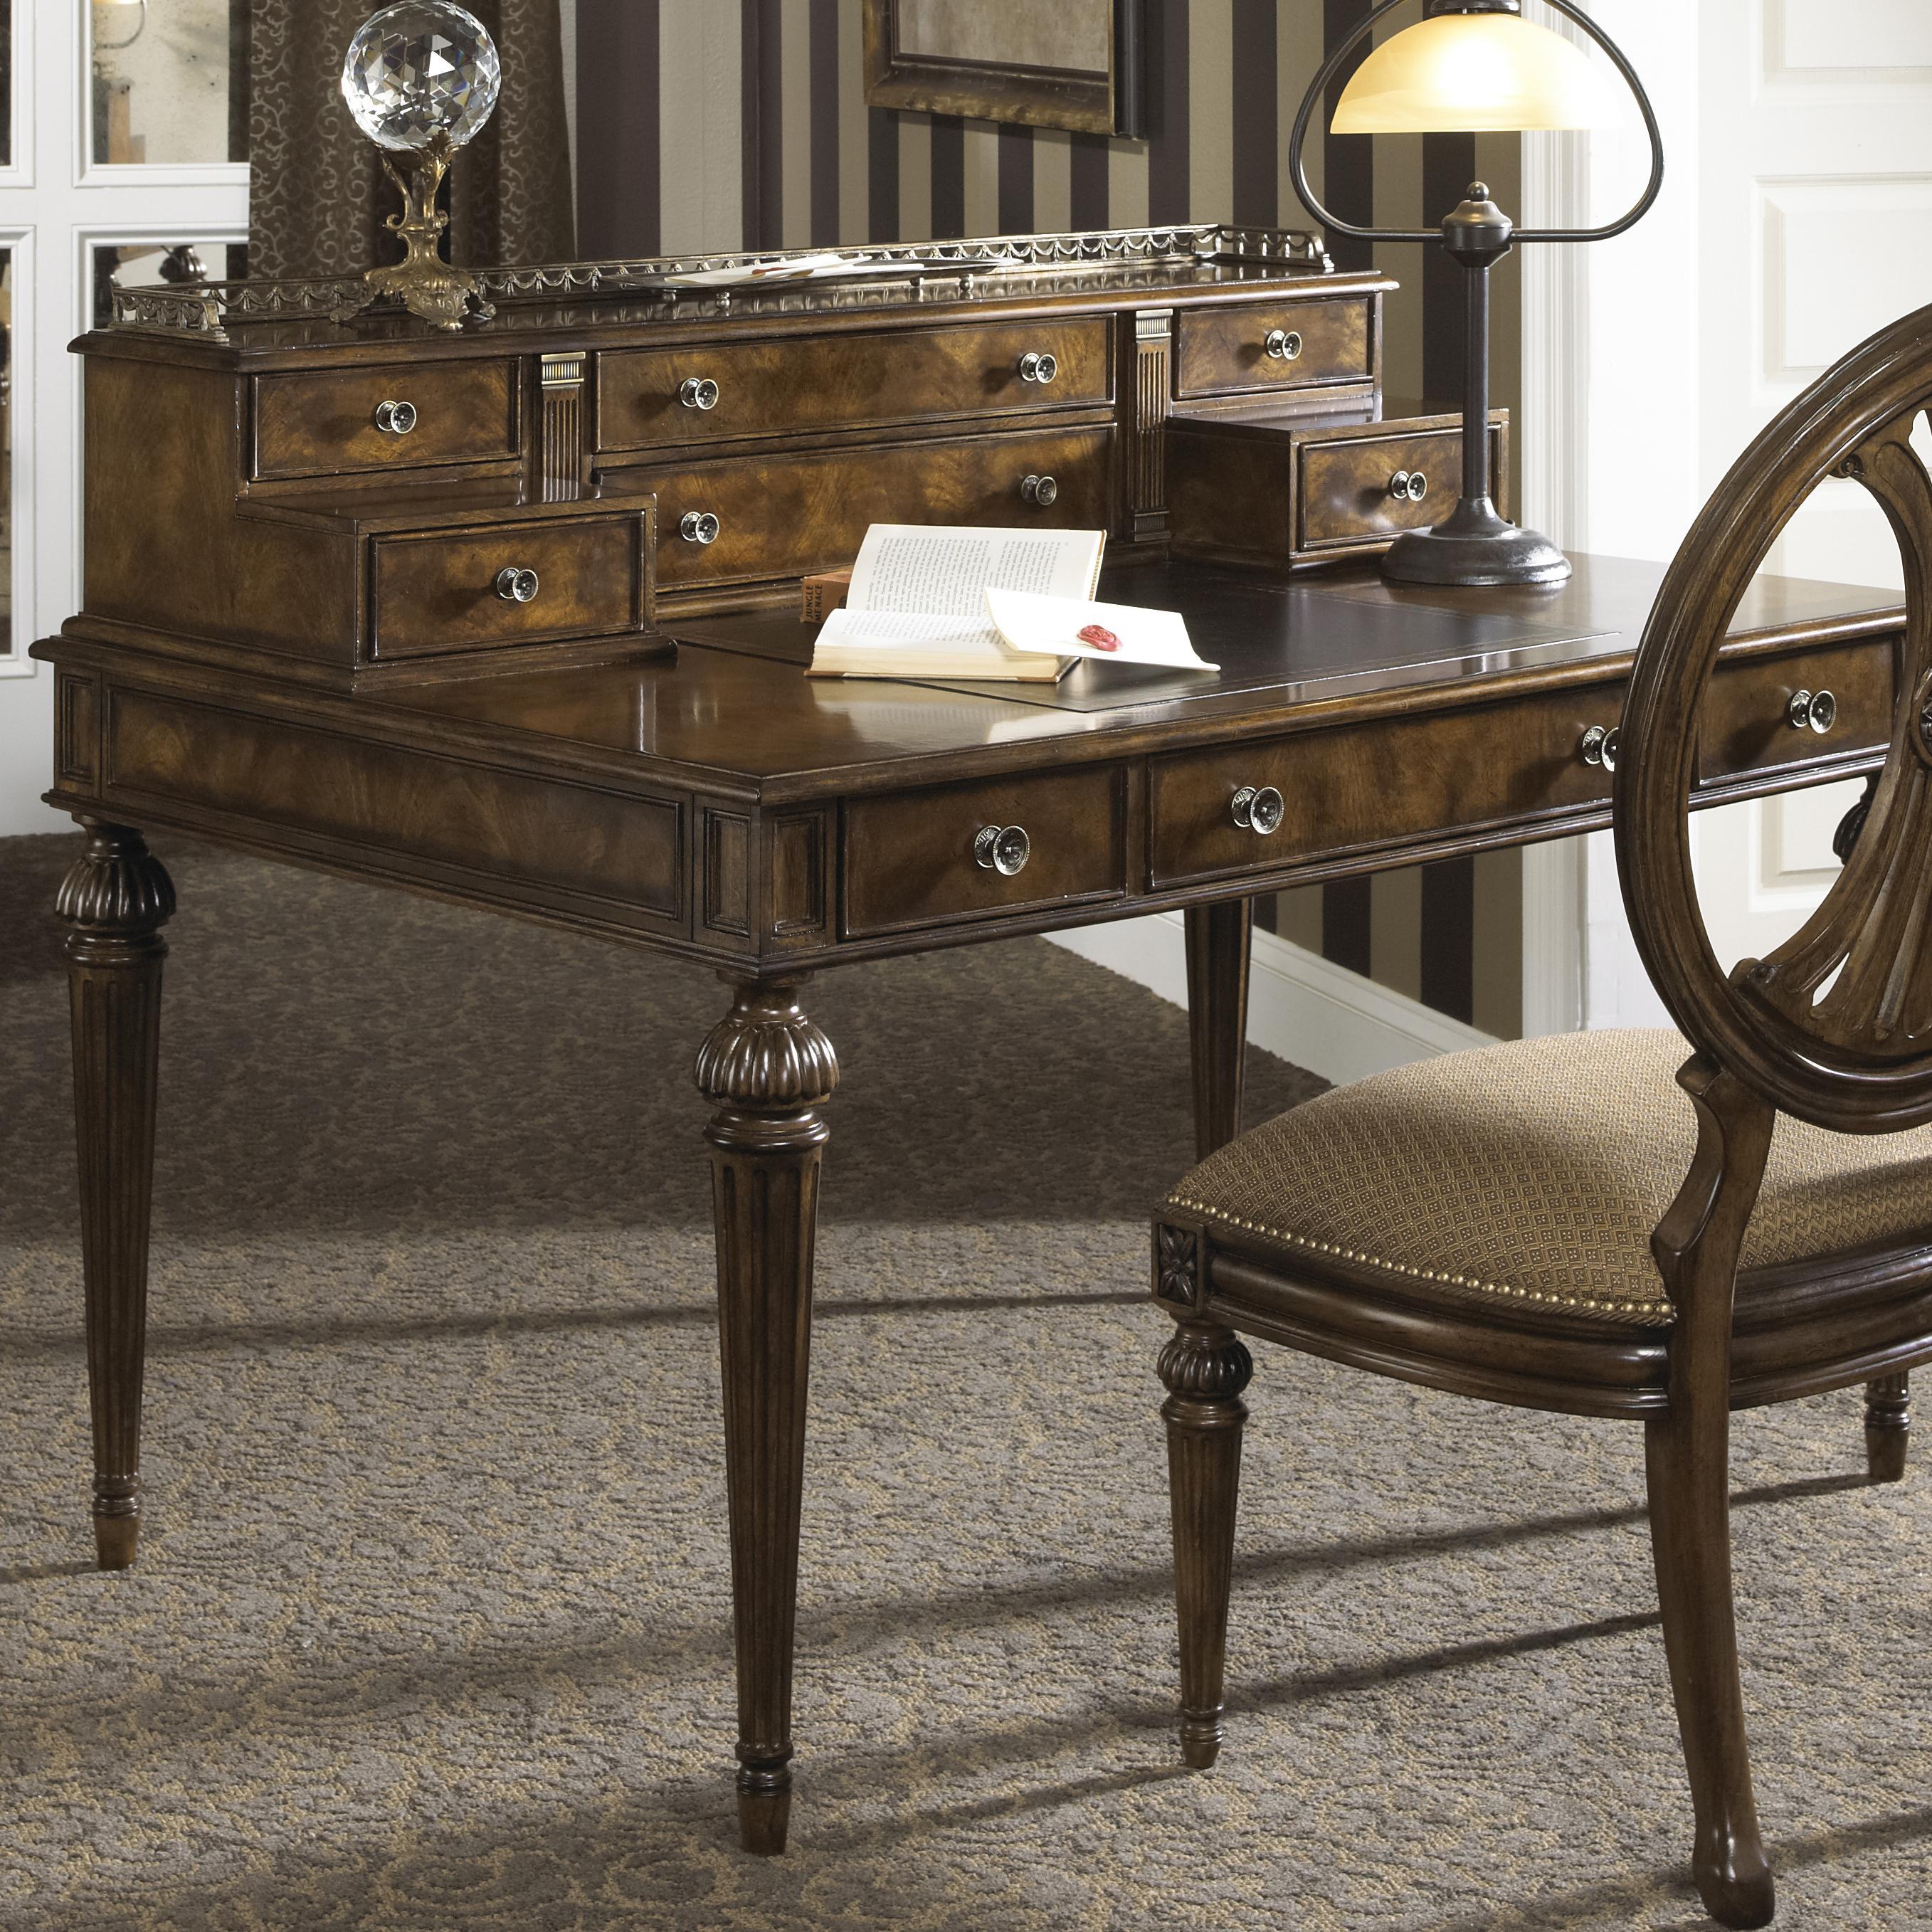 Merveilleux Fine Furniture Design BelvedereWriting Desk